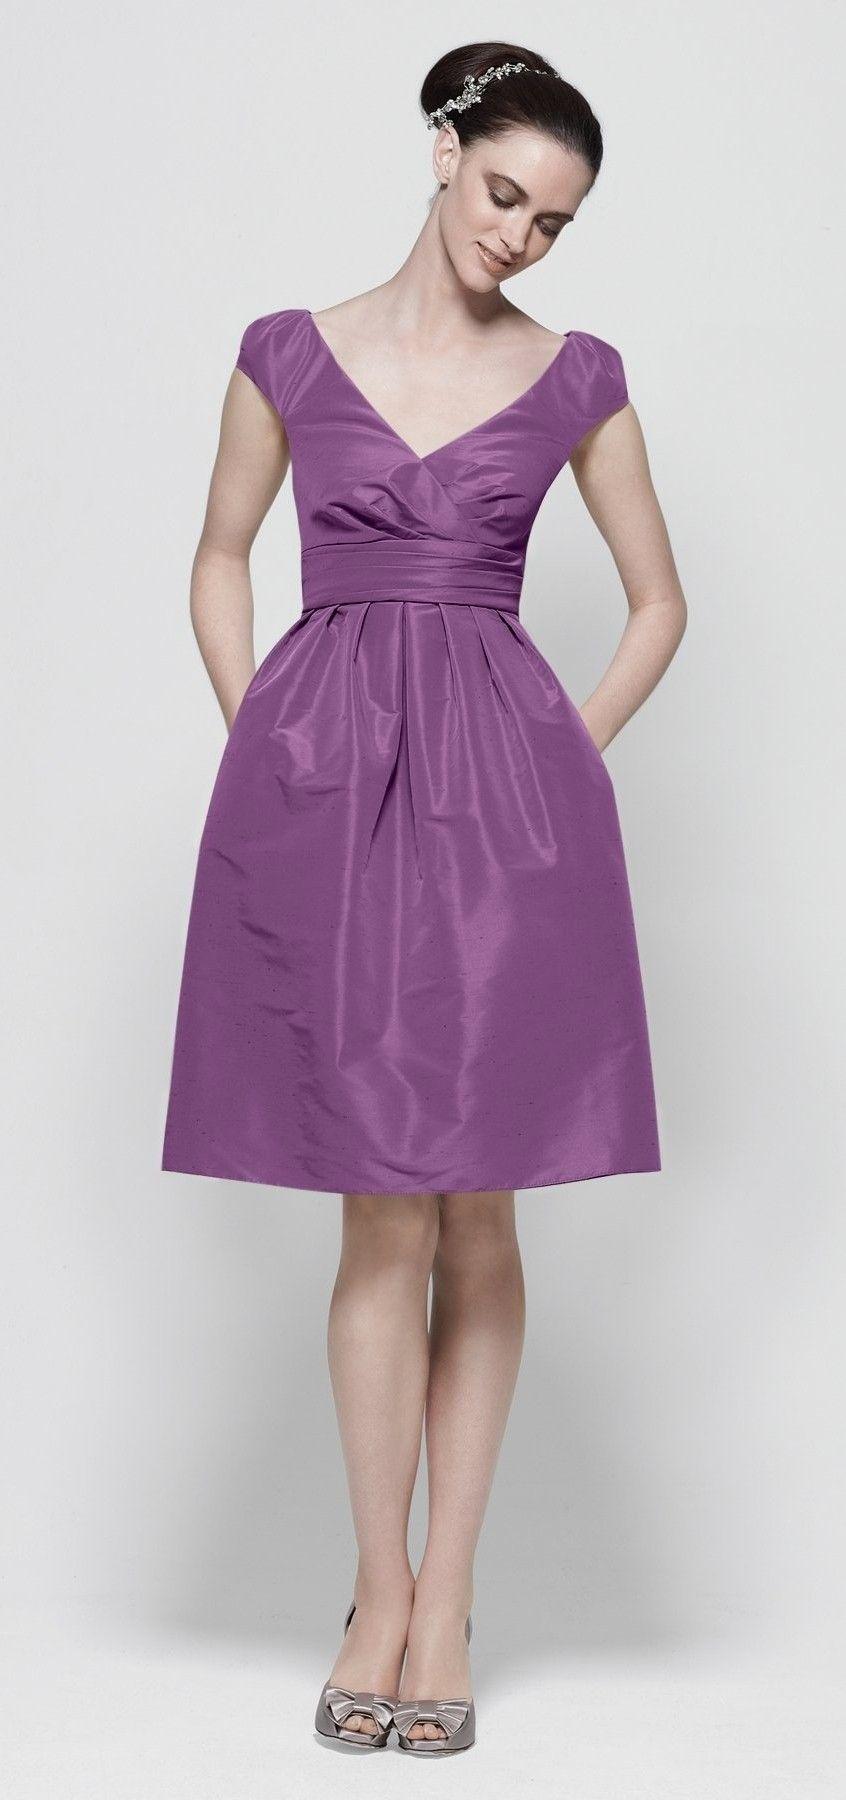 bridesmaid dress by watters $234 | Bridesmaids Dress Ideas | Pinterest